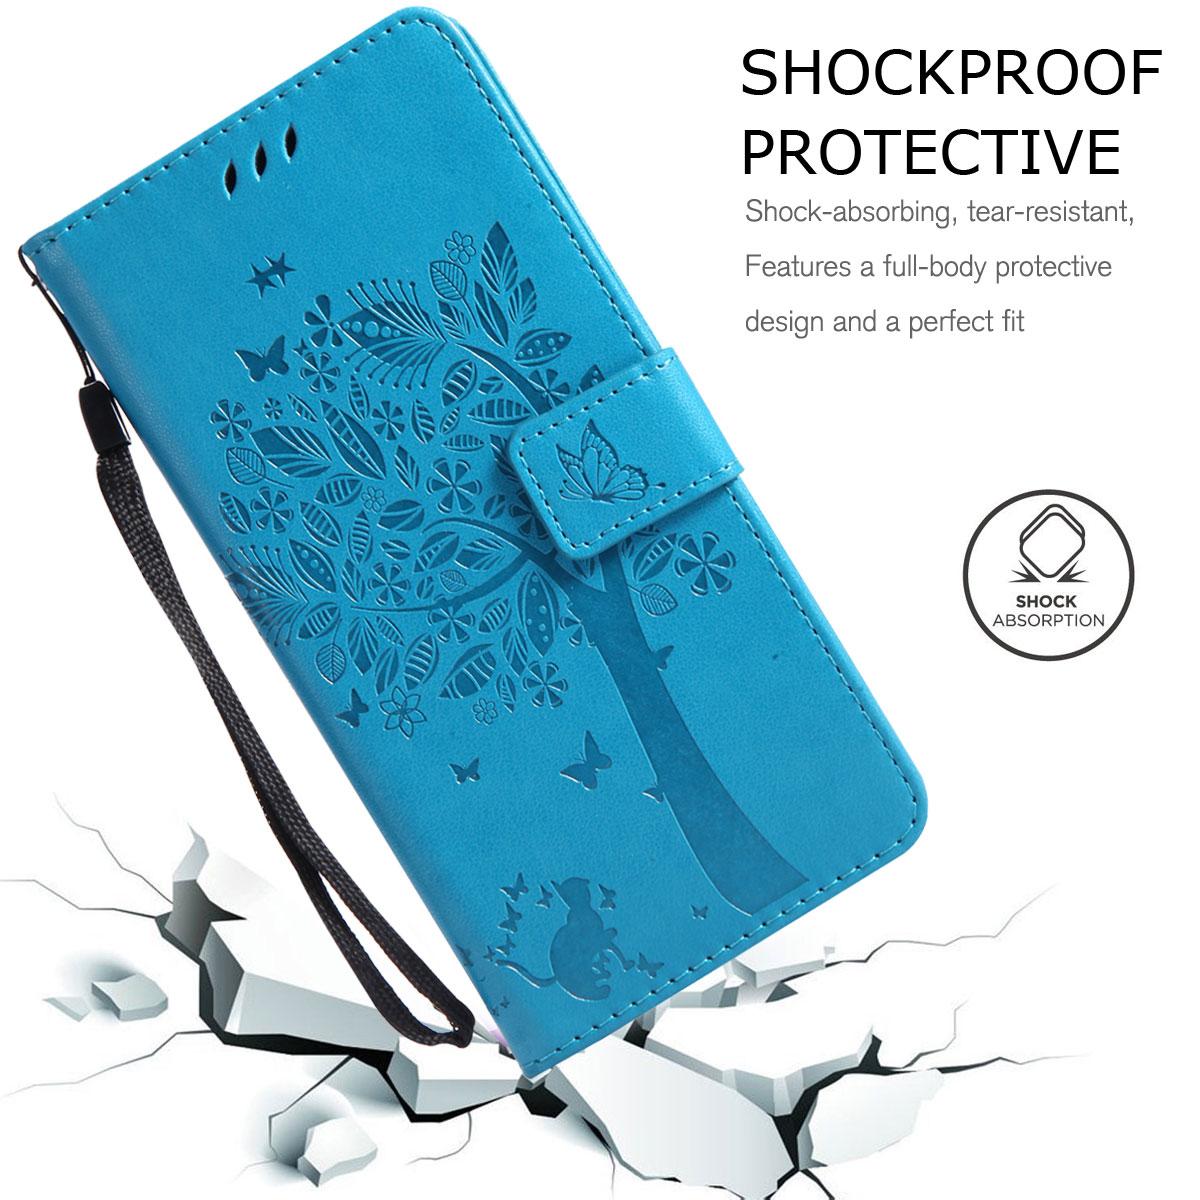 Magnetic-Leather-Credit-Card-Holder-Flip-Case-Cover-For-Google-Pixel-2-2-XL thumbnail 25